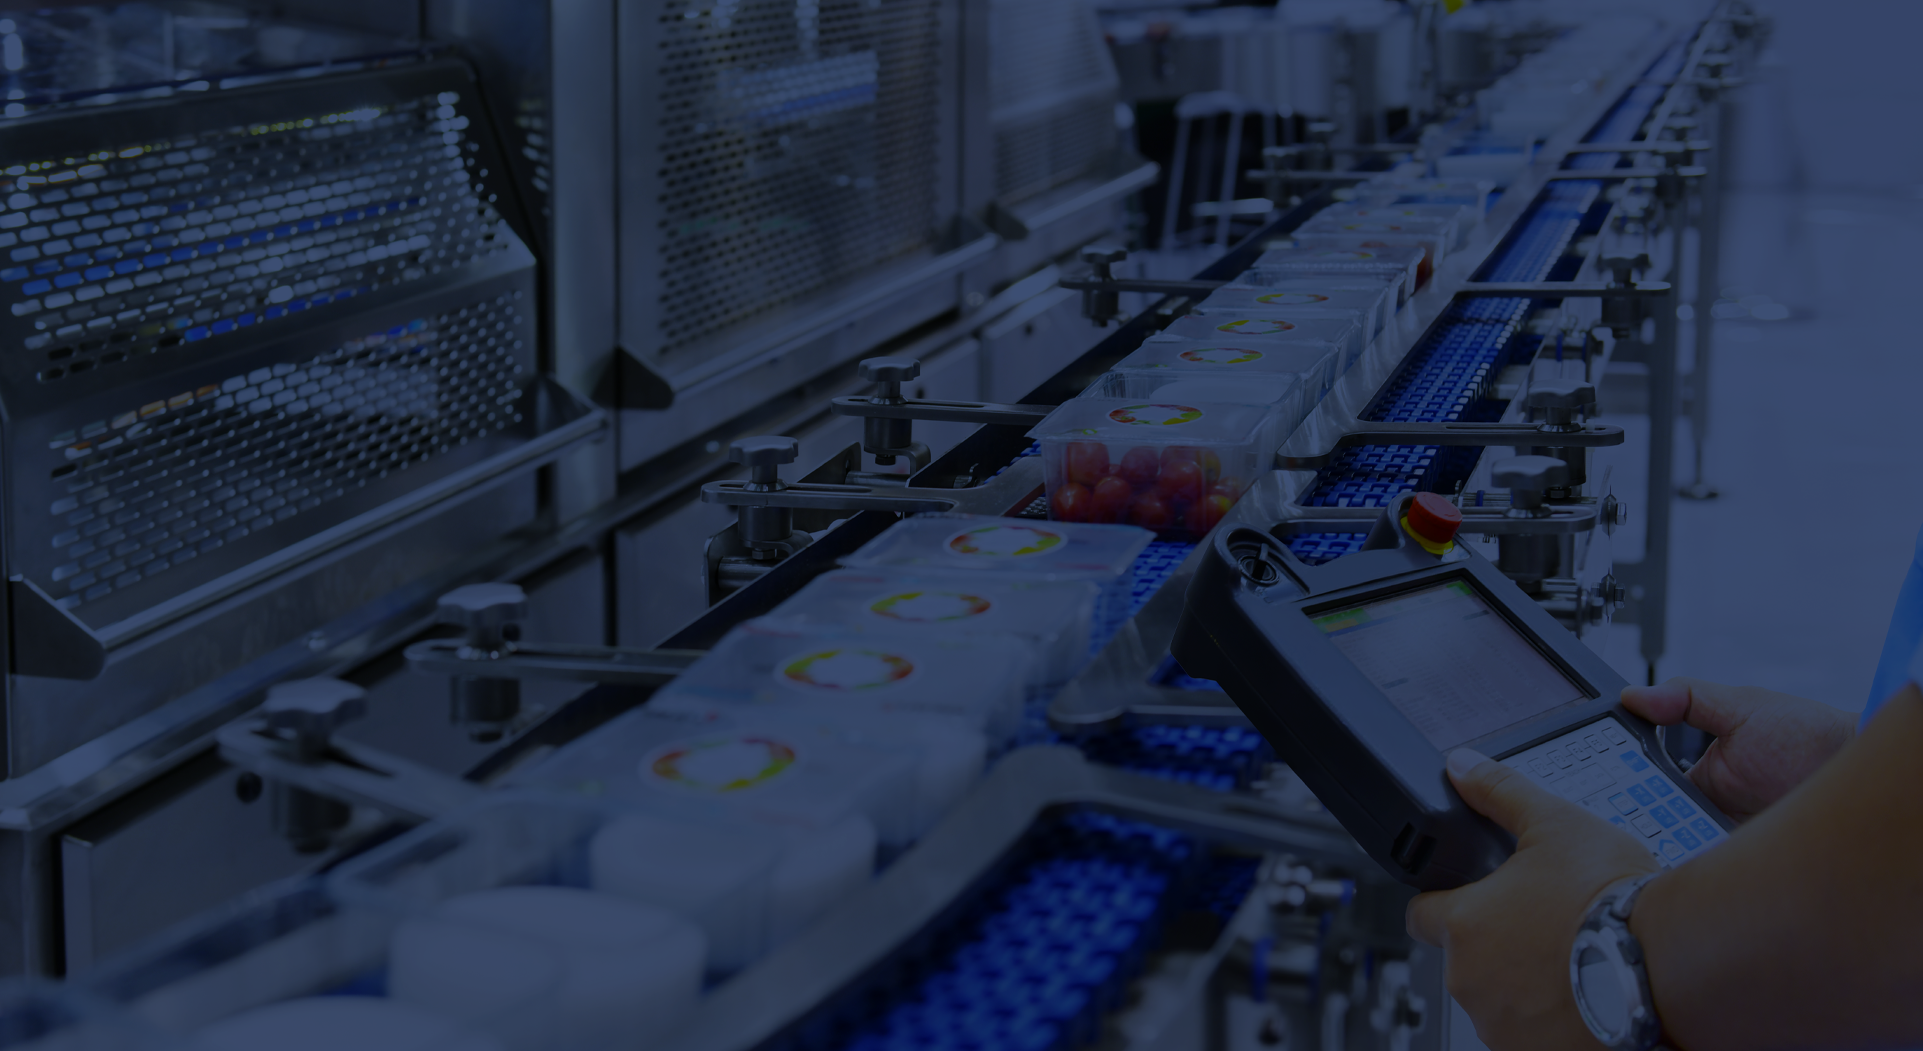 Warehouse Automation Service - May 2021